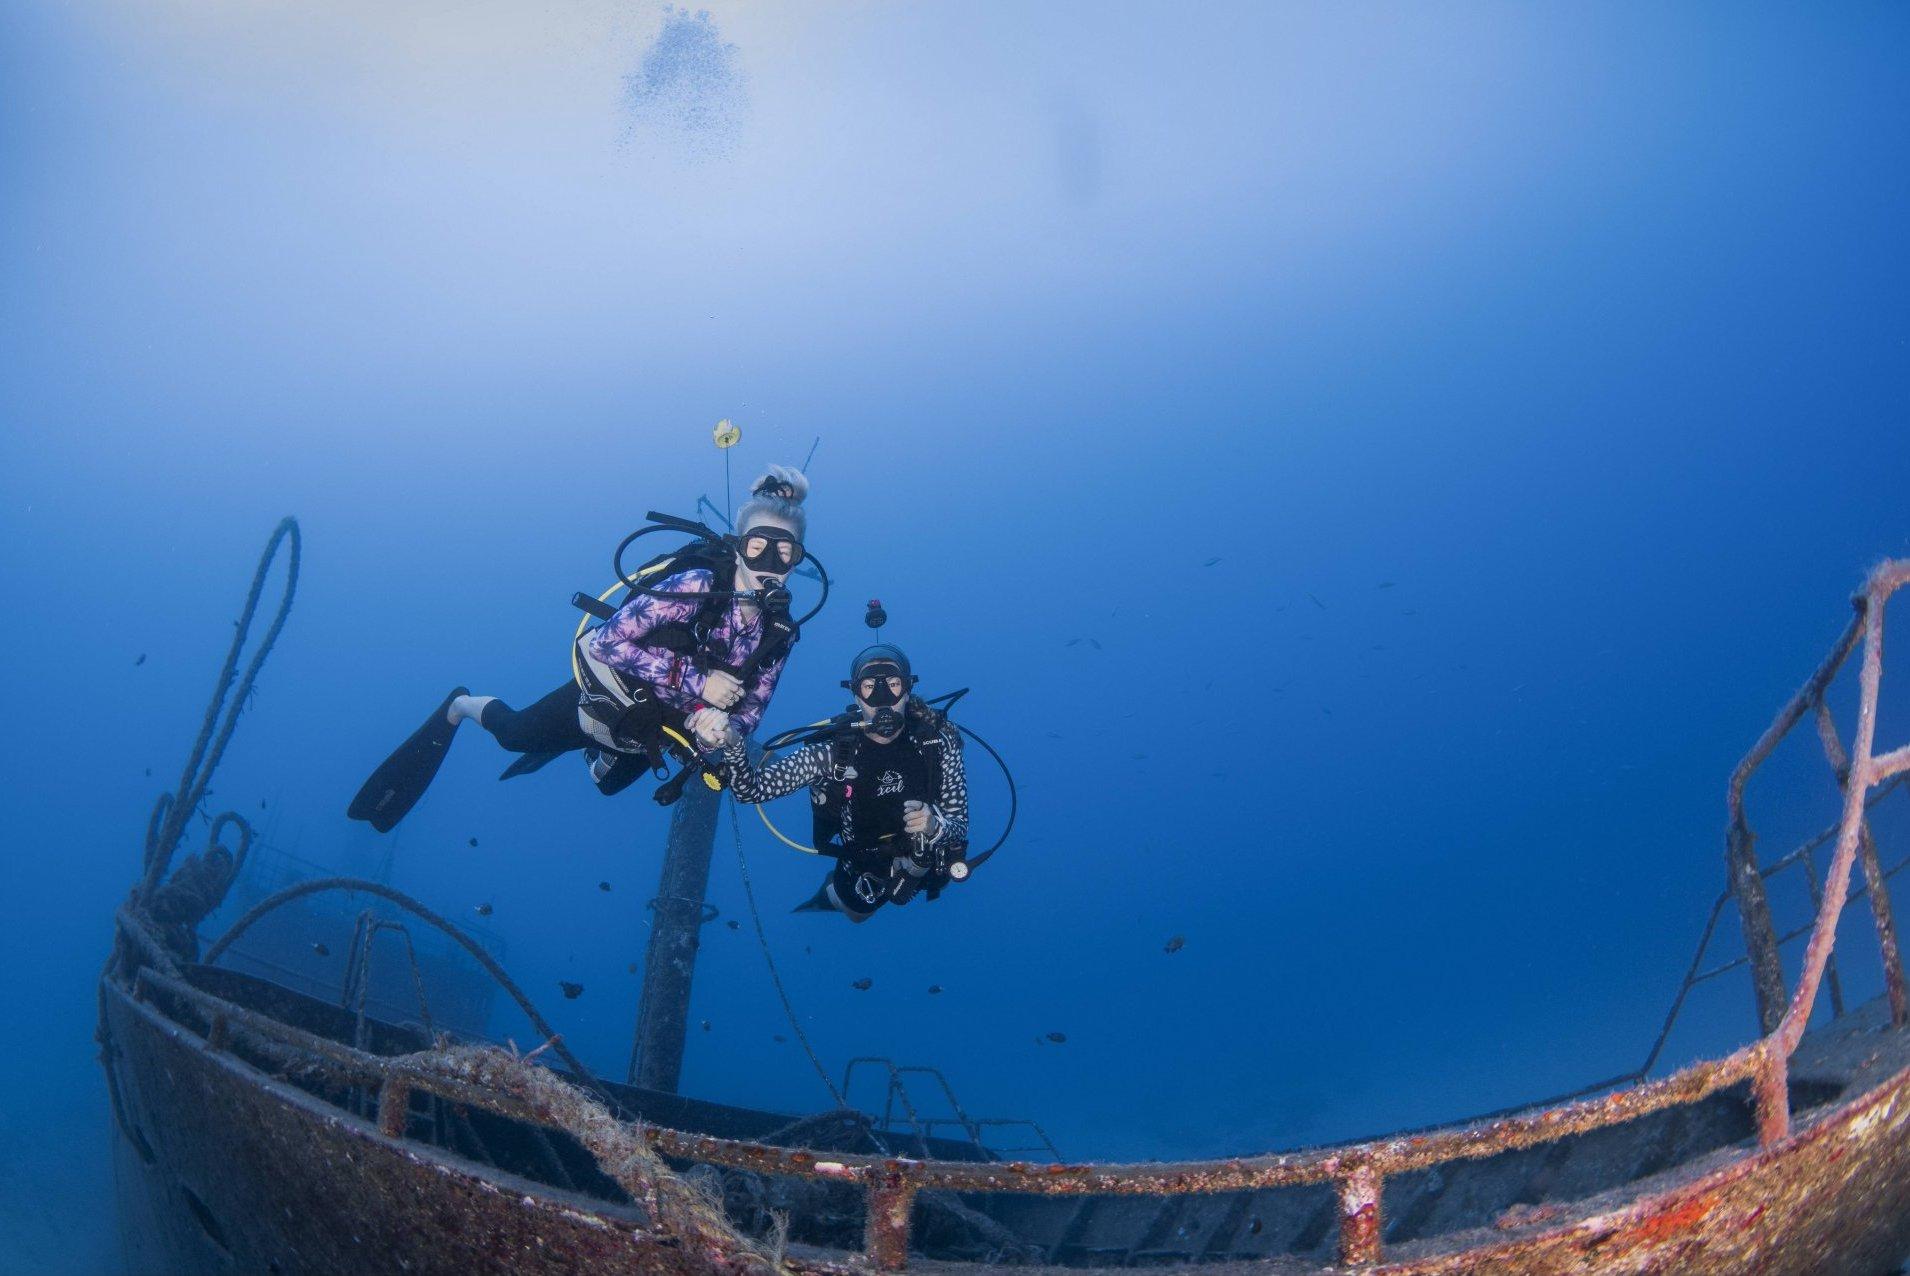 Professionelle Tauchausbildung auf Mauritius, 2 gernerations diiving, shipwreck, Mauritius, Girls that scuba